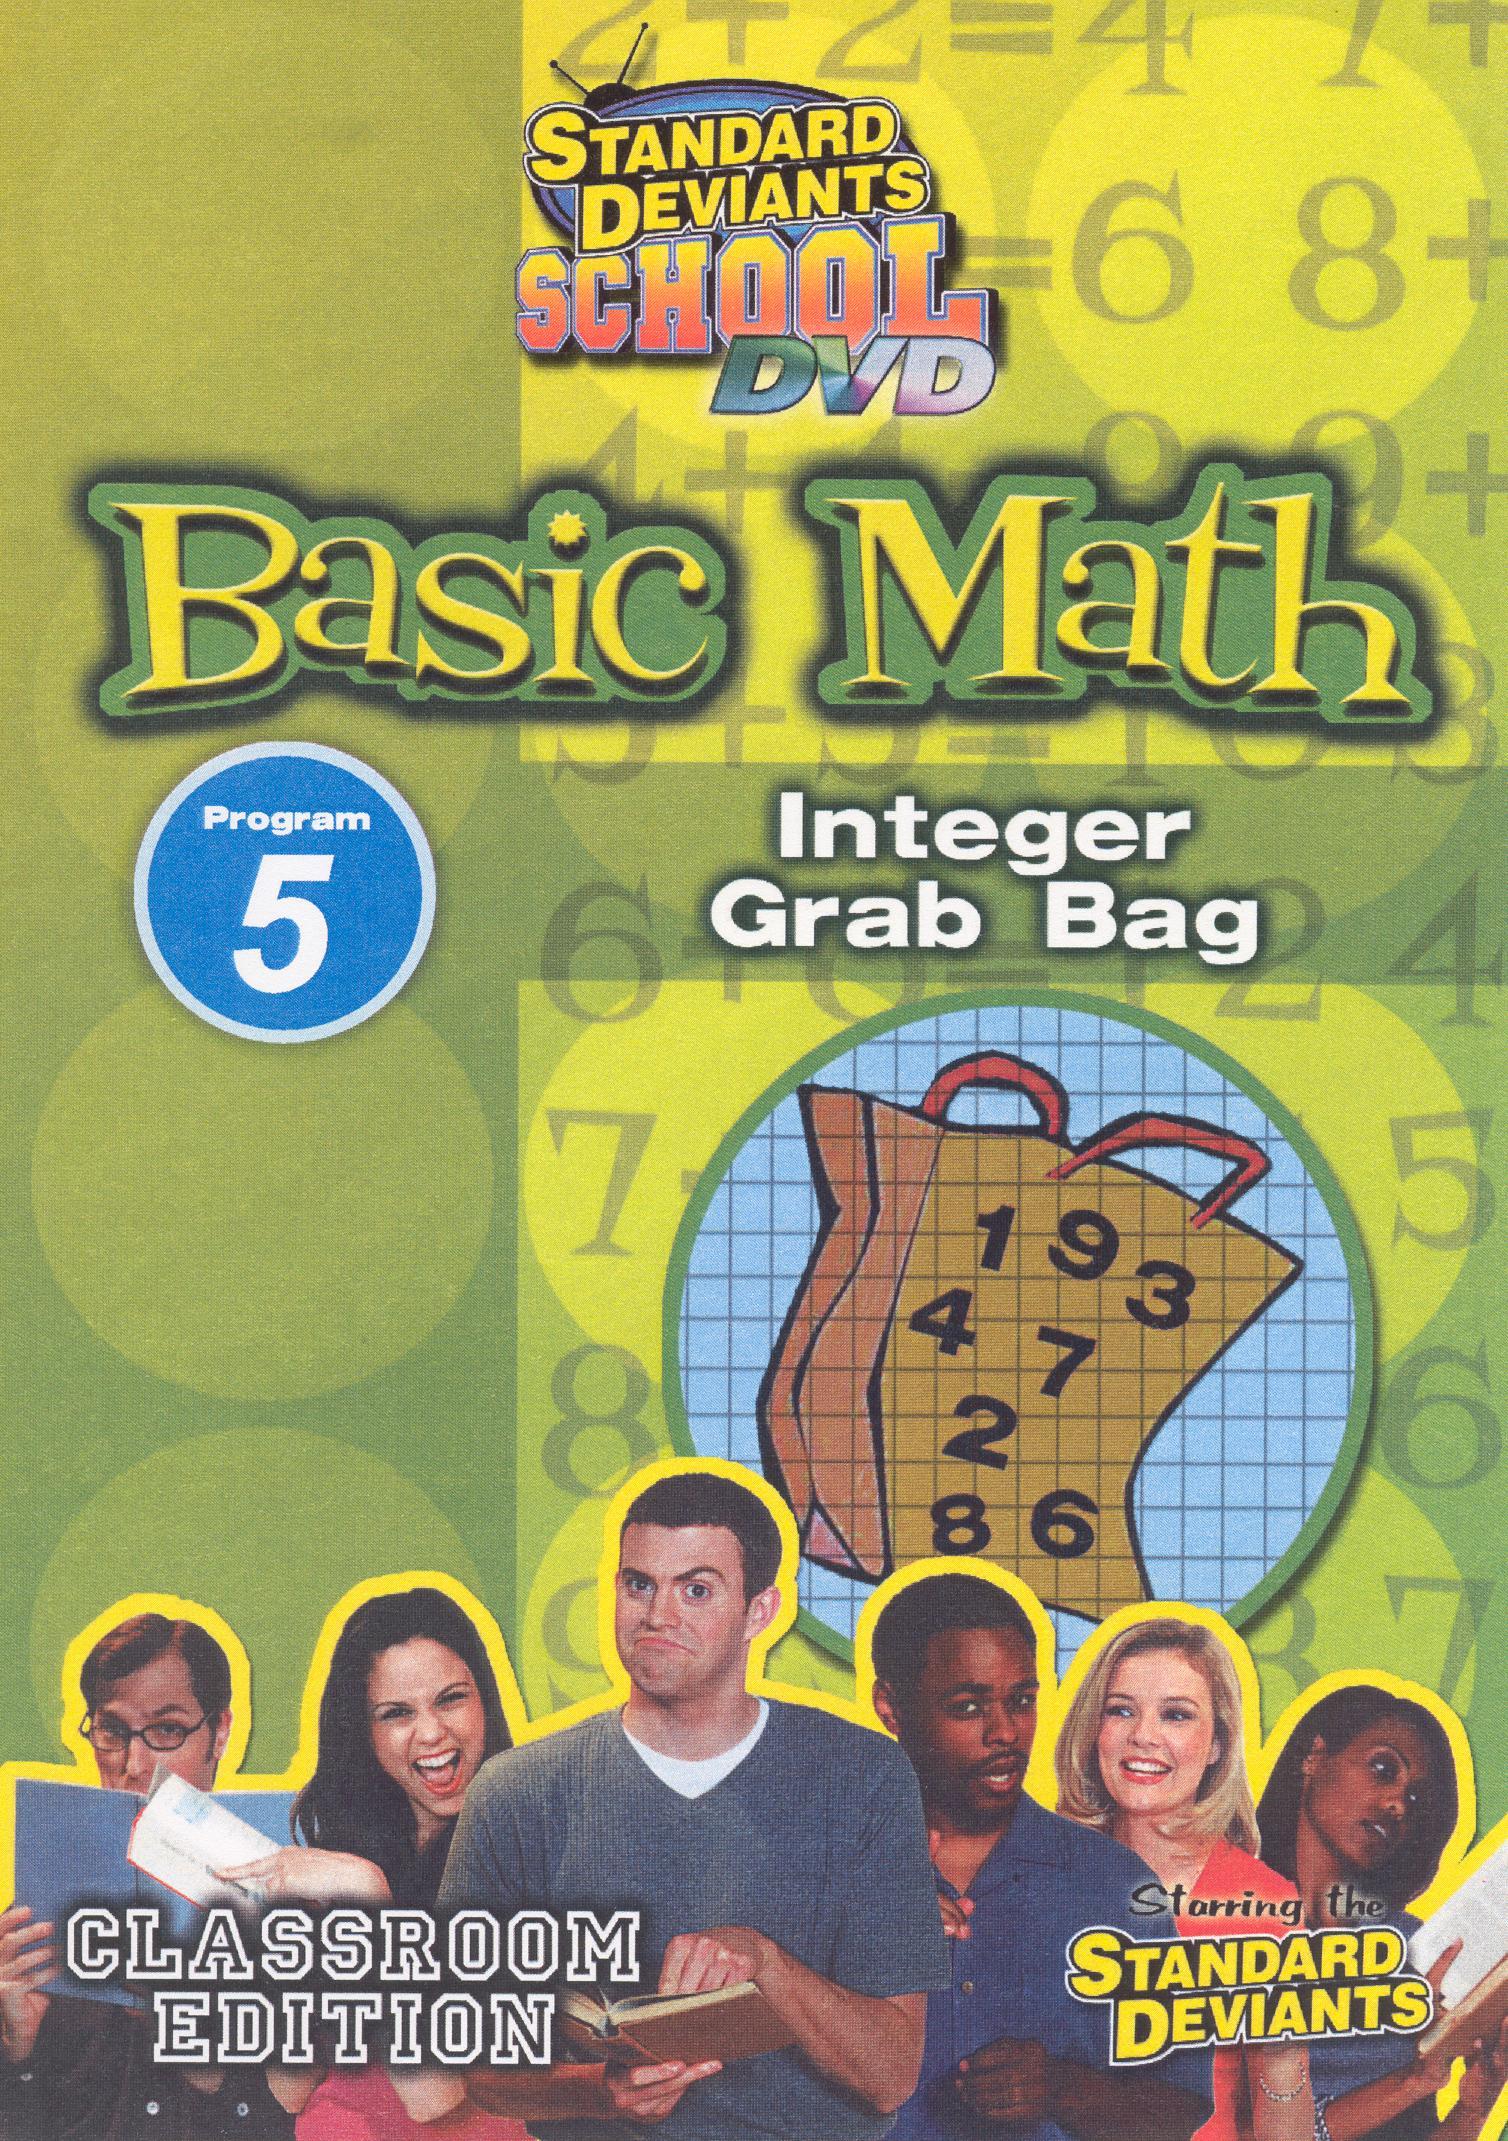 Standard Deviants School: Basic Math, Program 5